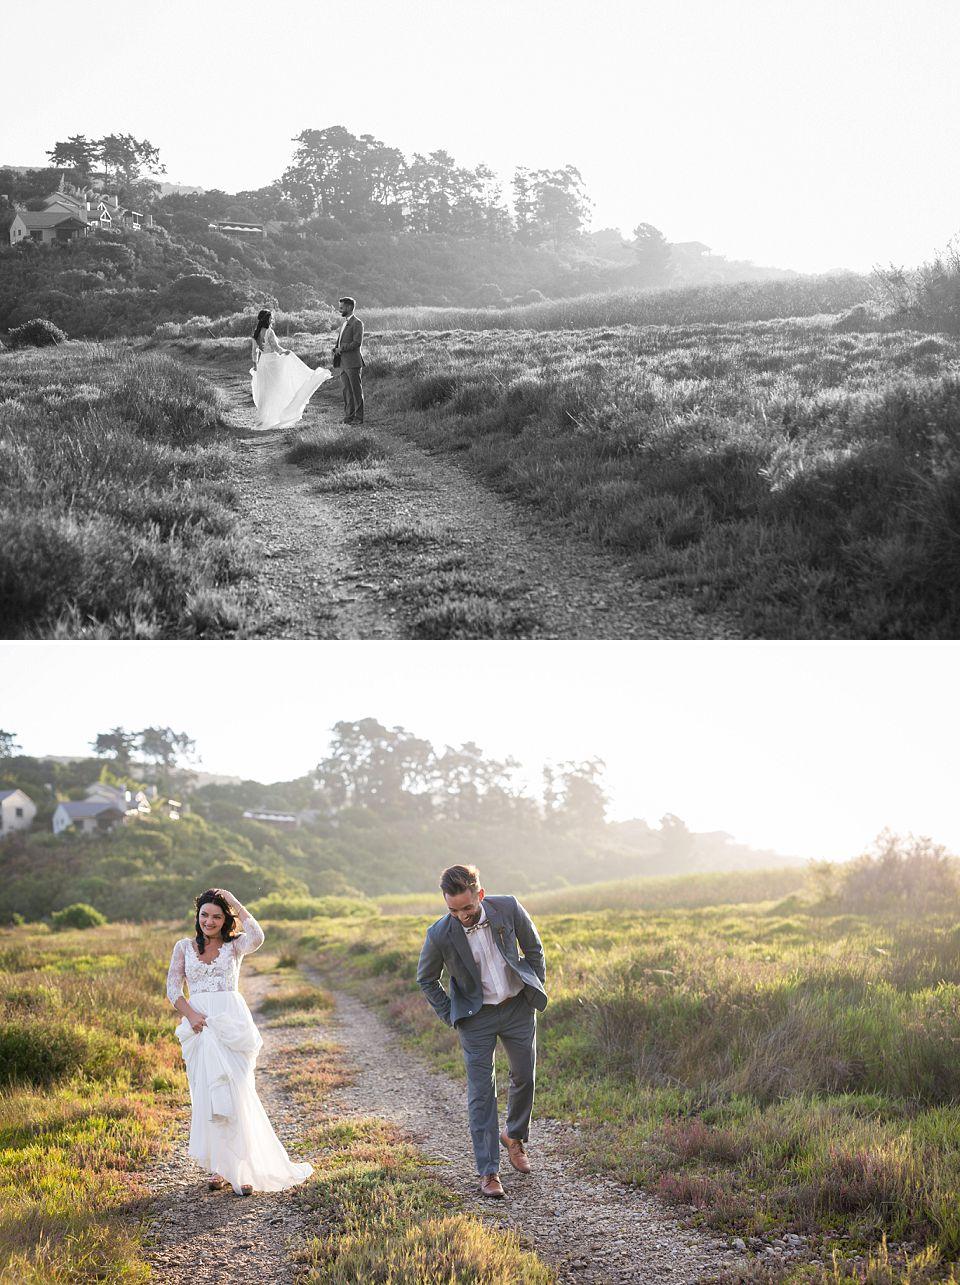 Runaway Romance | Emily Moon Elopement | www.runawayromance.com